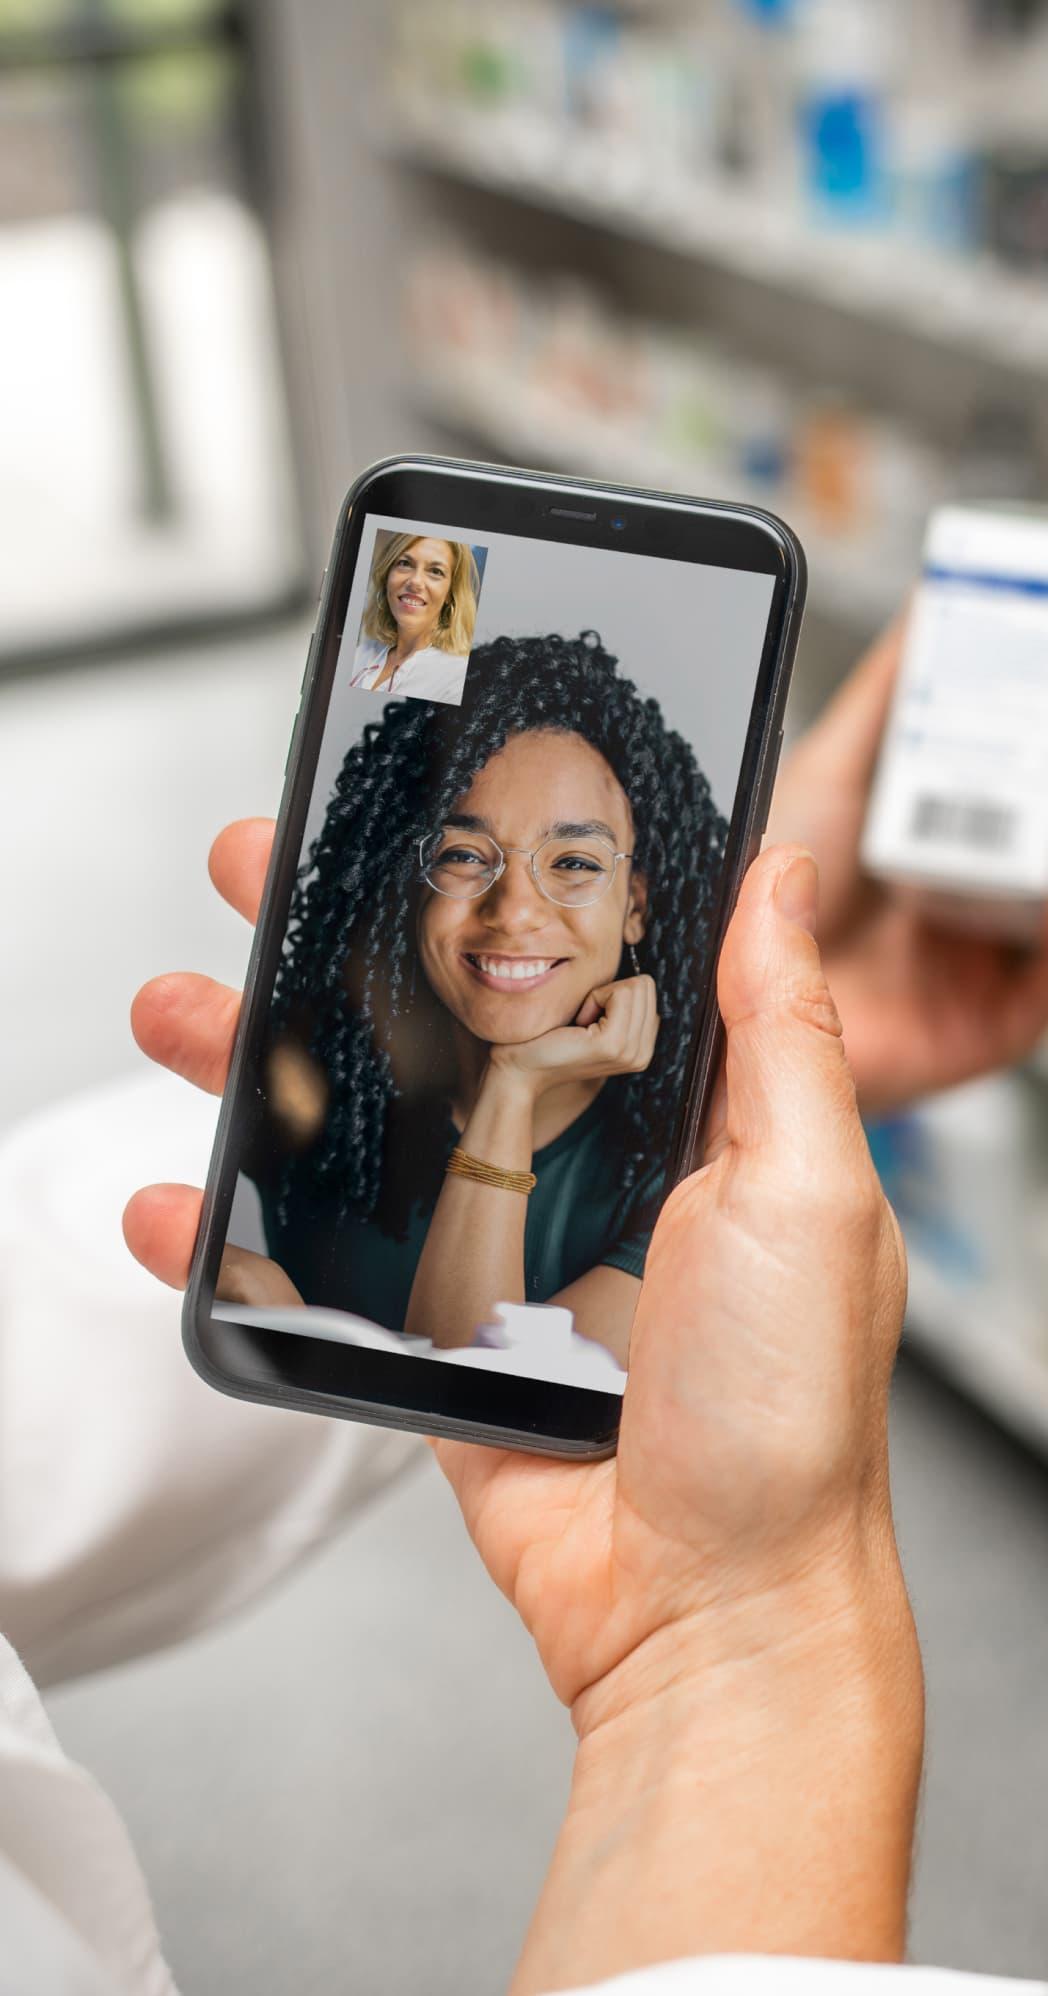 web and mobile phone call